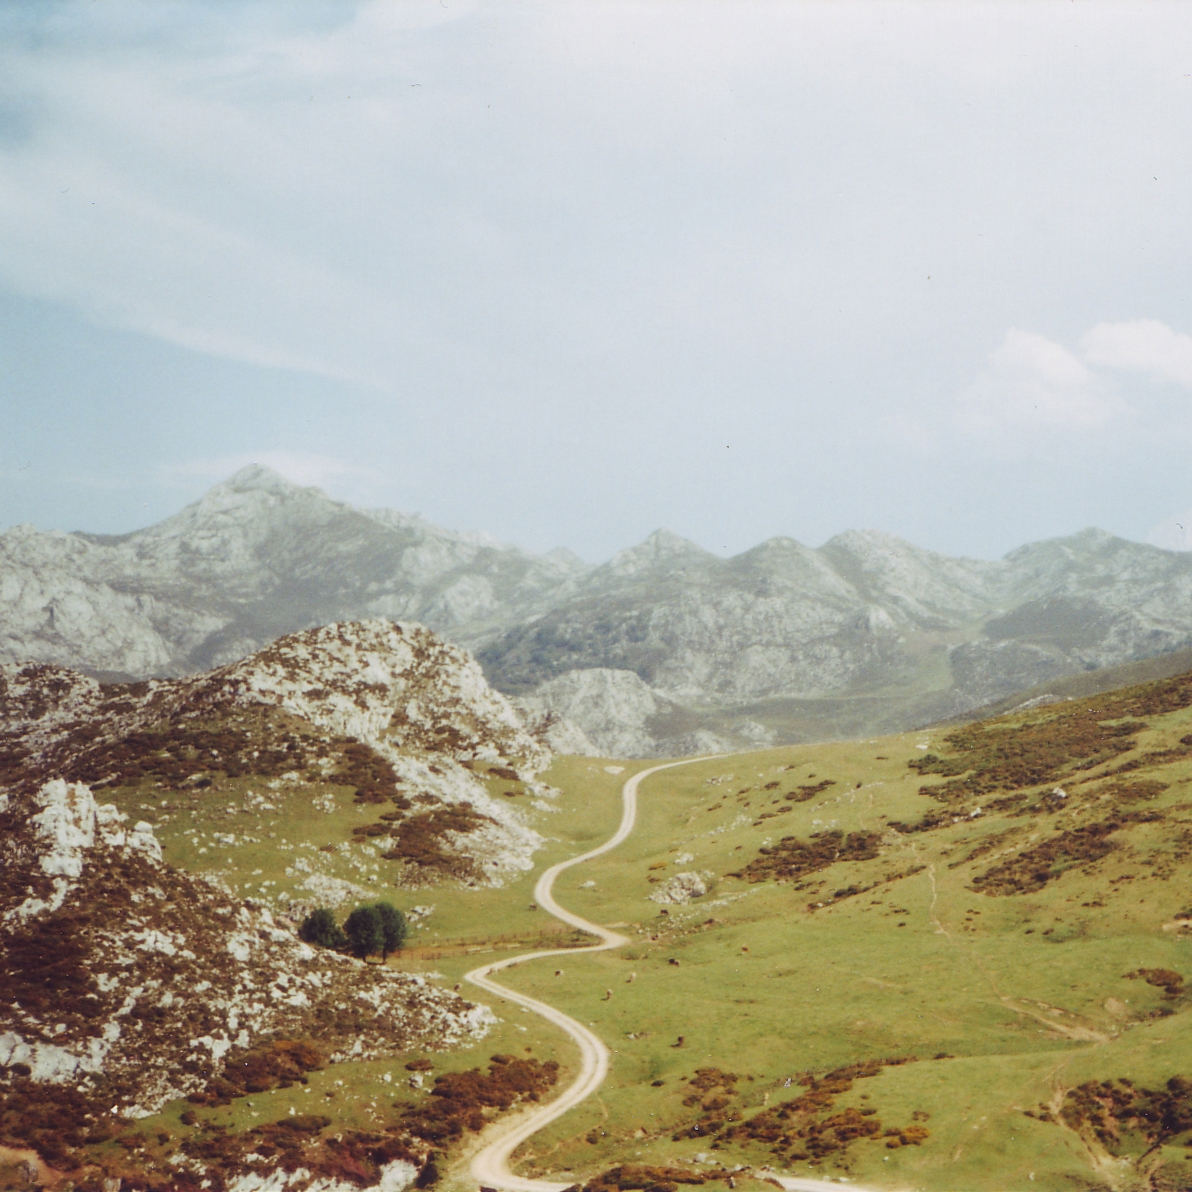 ANALOG MEMORIES - photography, landscape - lapremioqueen   ello